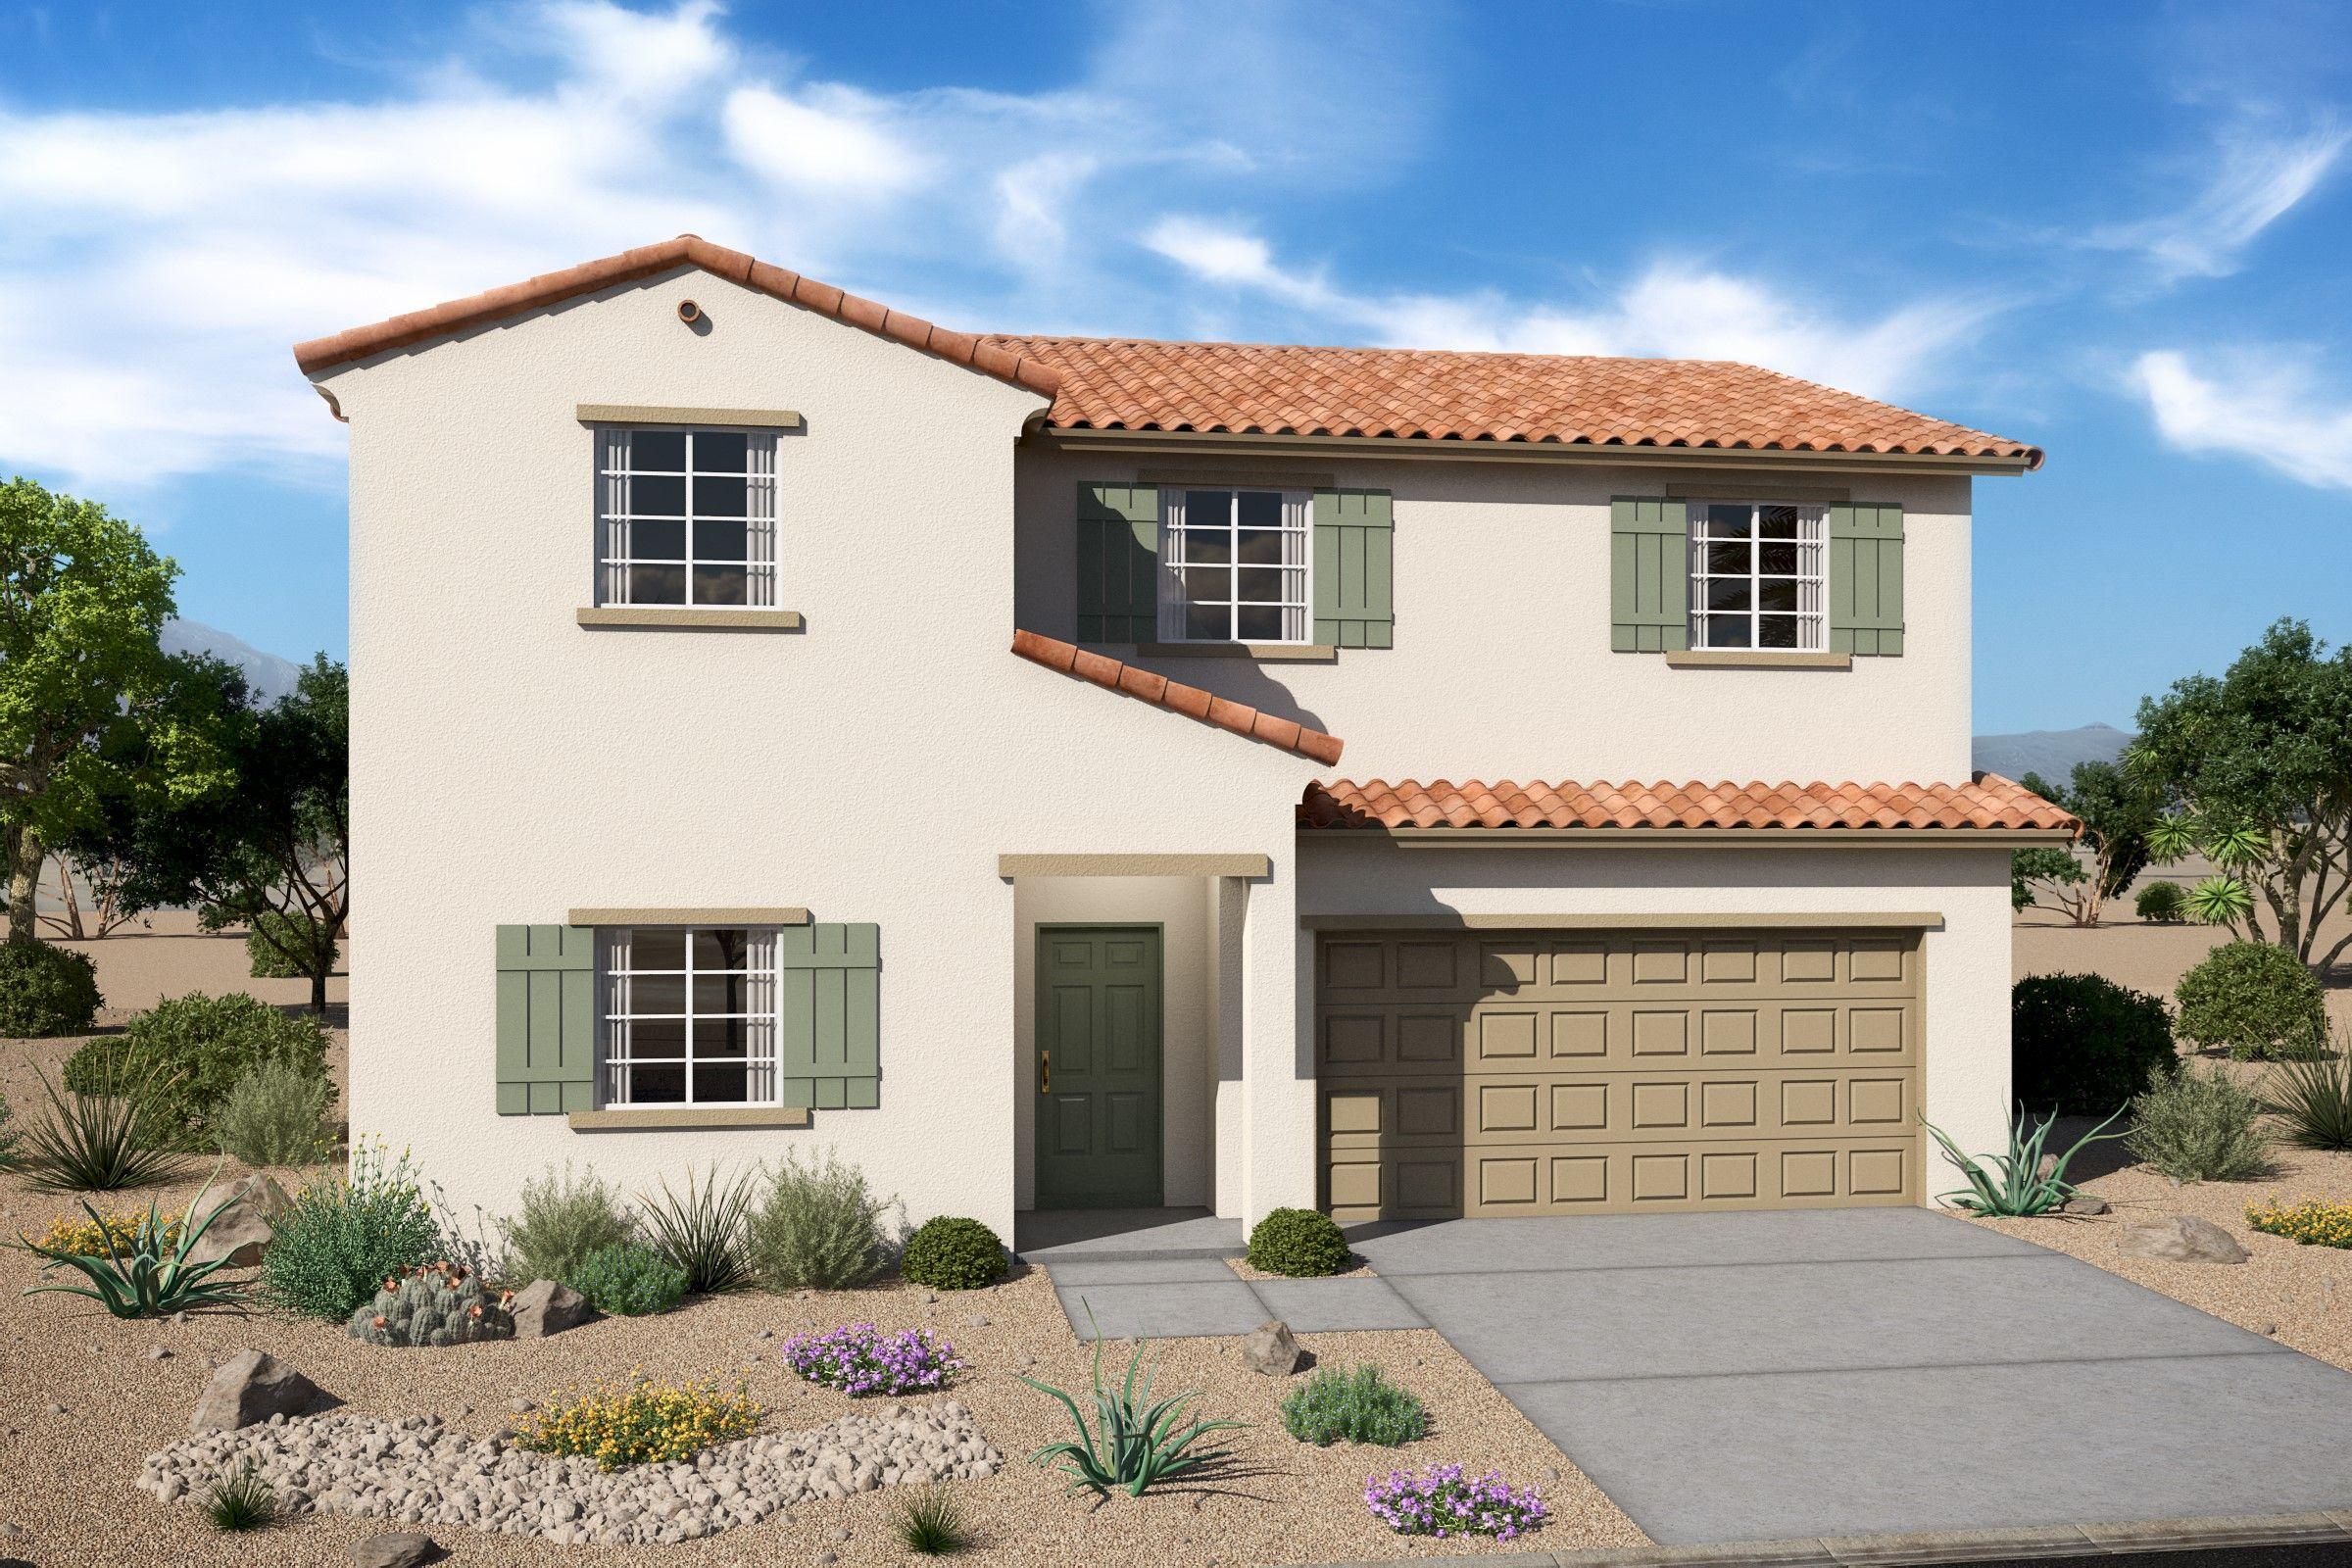 Single Family for Sale at Ascend At Villago - Rainier 251 East Atlantic Drive Casa Grande, Arizona 85122 United States